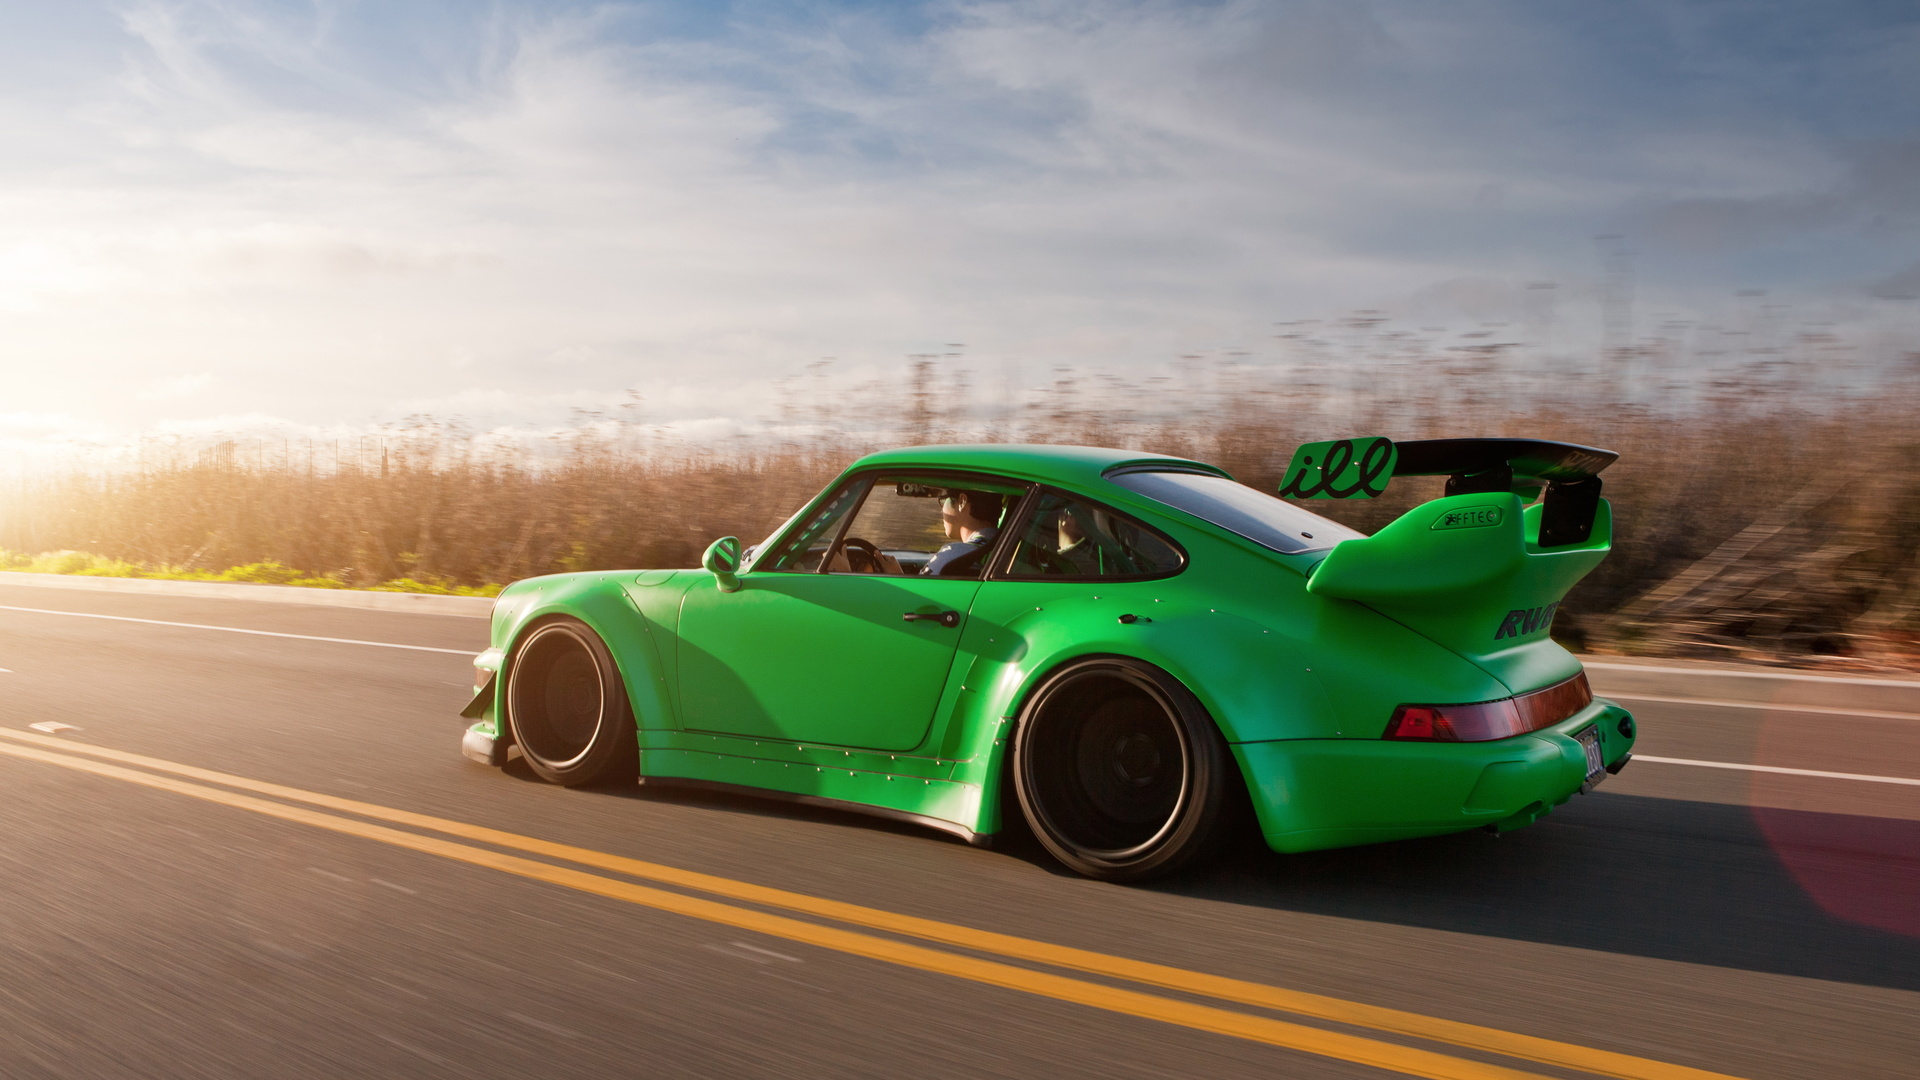 машина, дорога, автомобиль, спортивный тюнинг, 911, Porshe